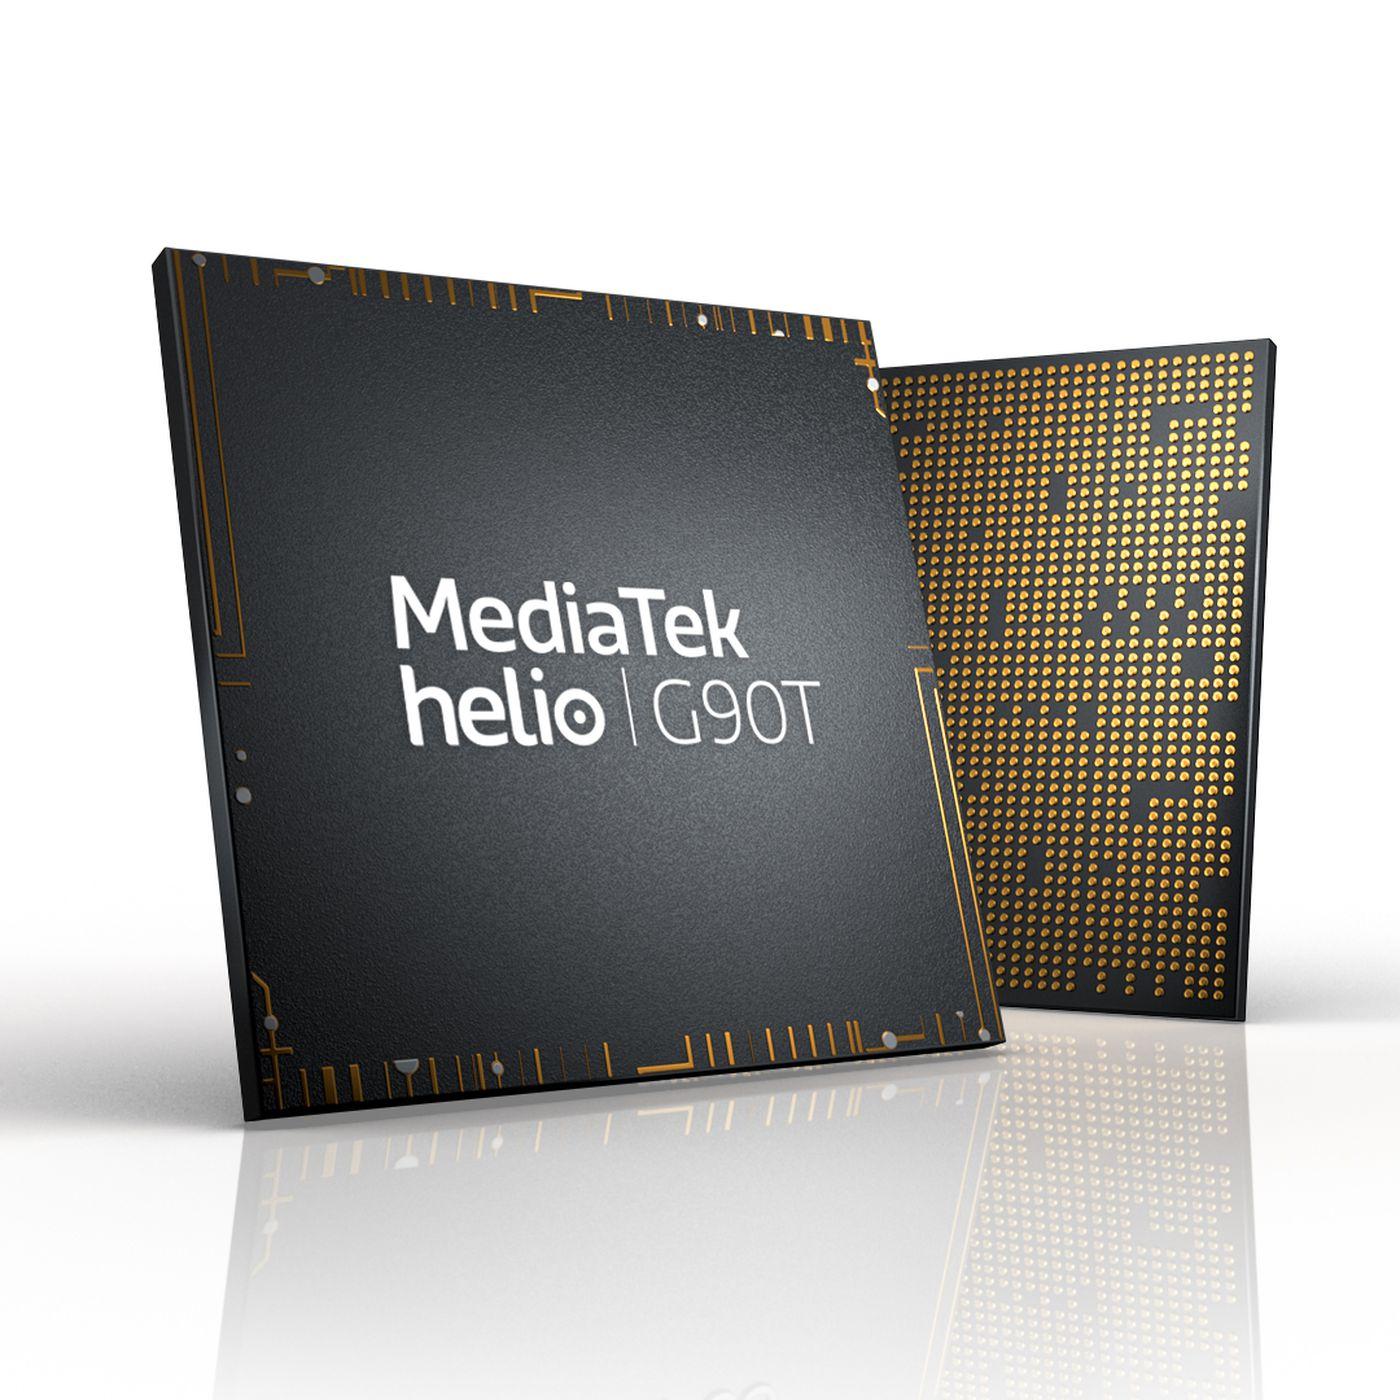 MediaTek announces flagship gaming-focused Helio G90 mobile